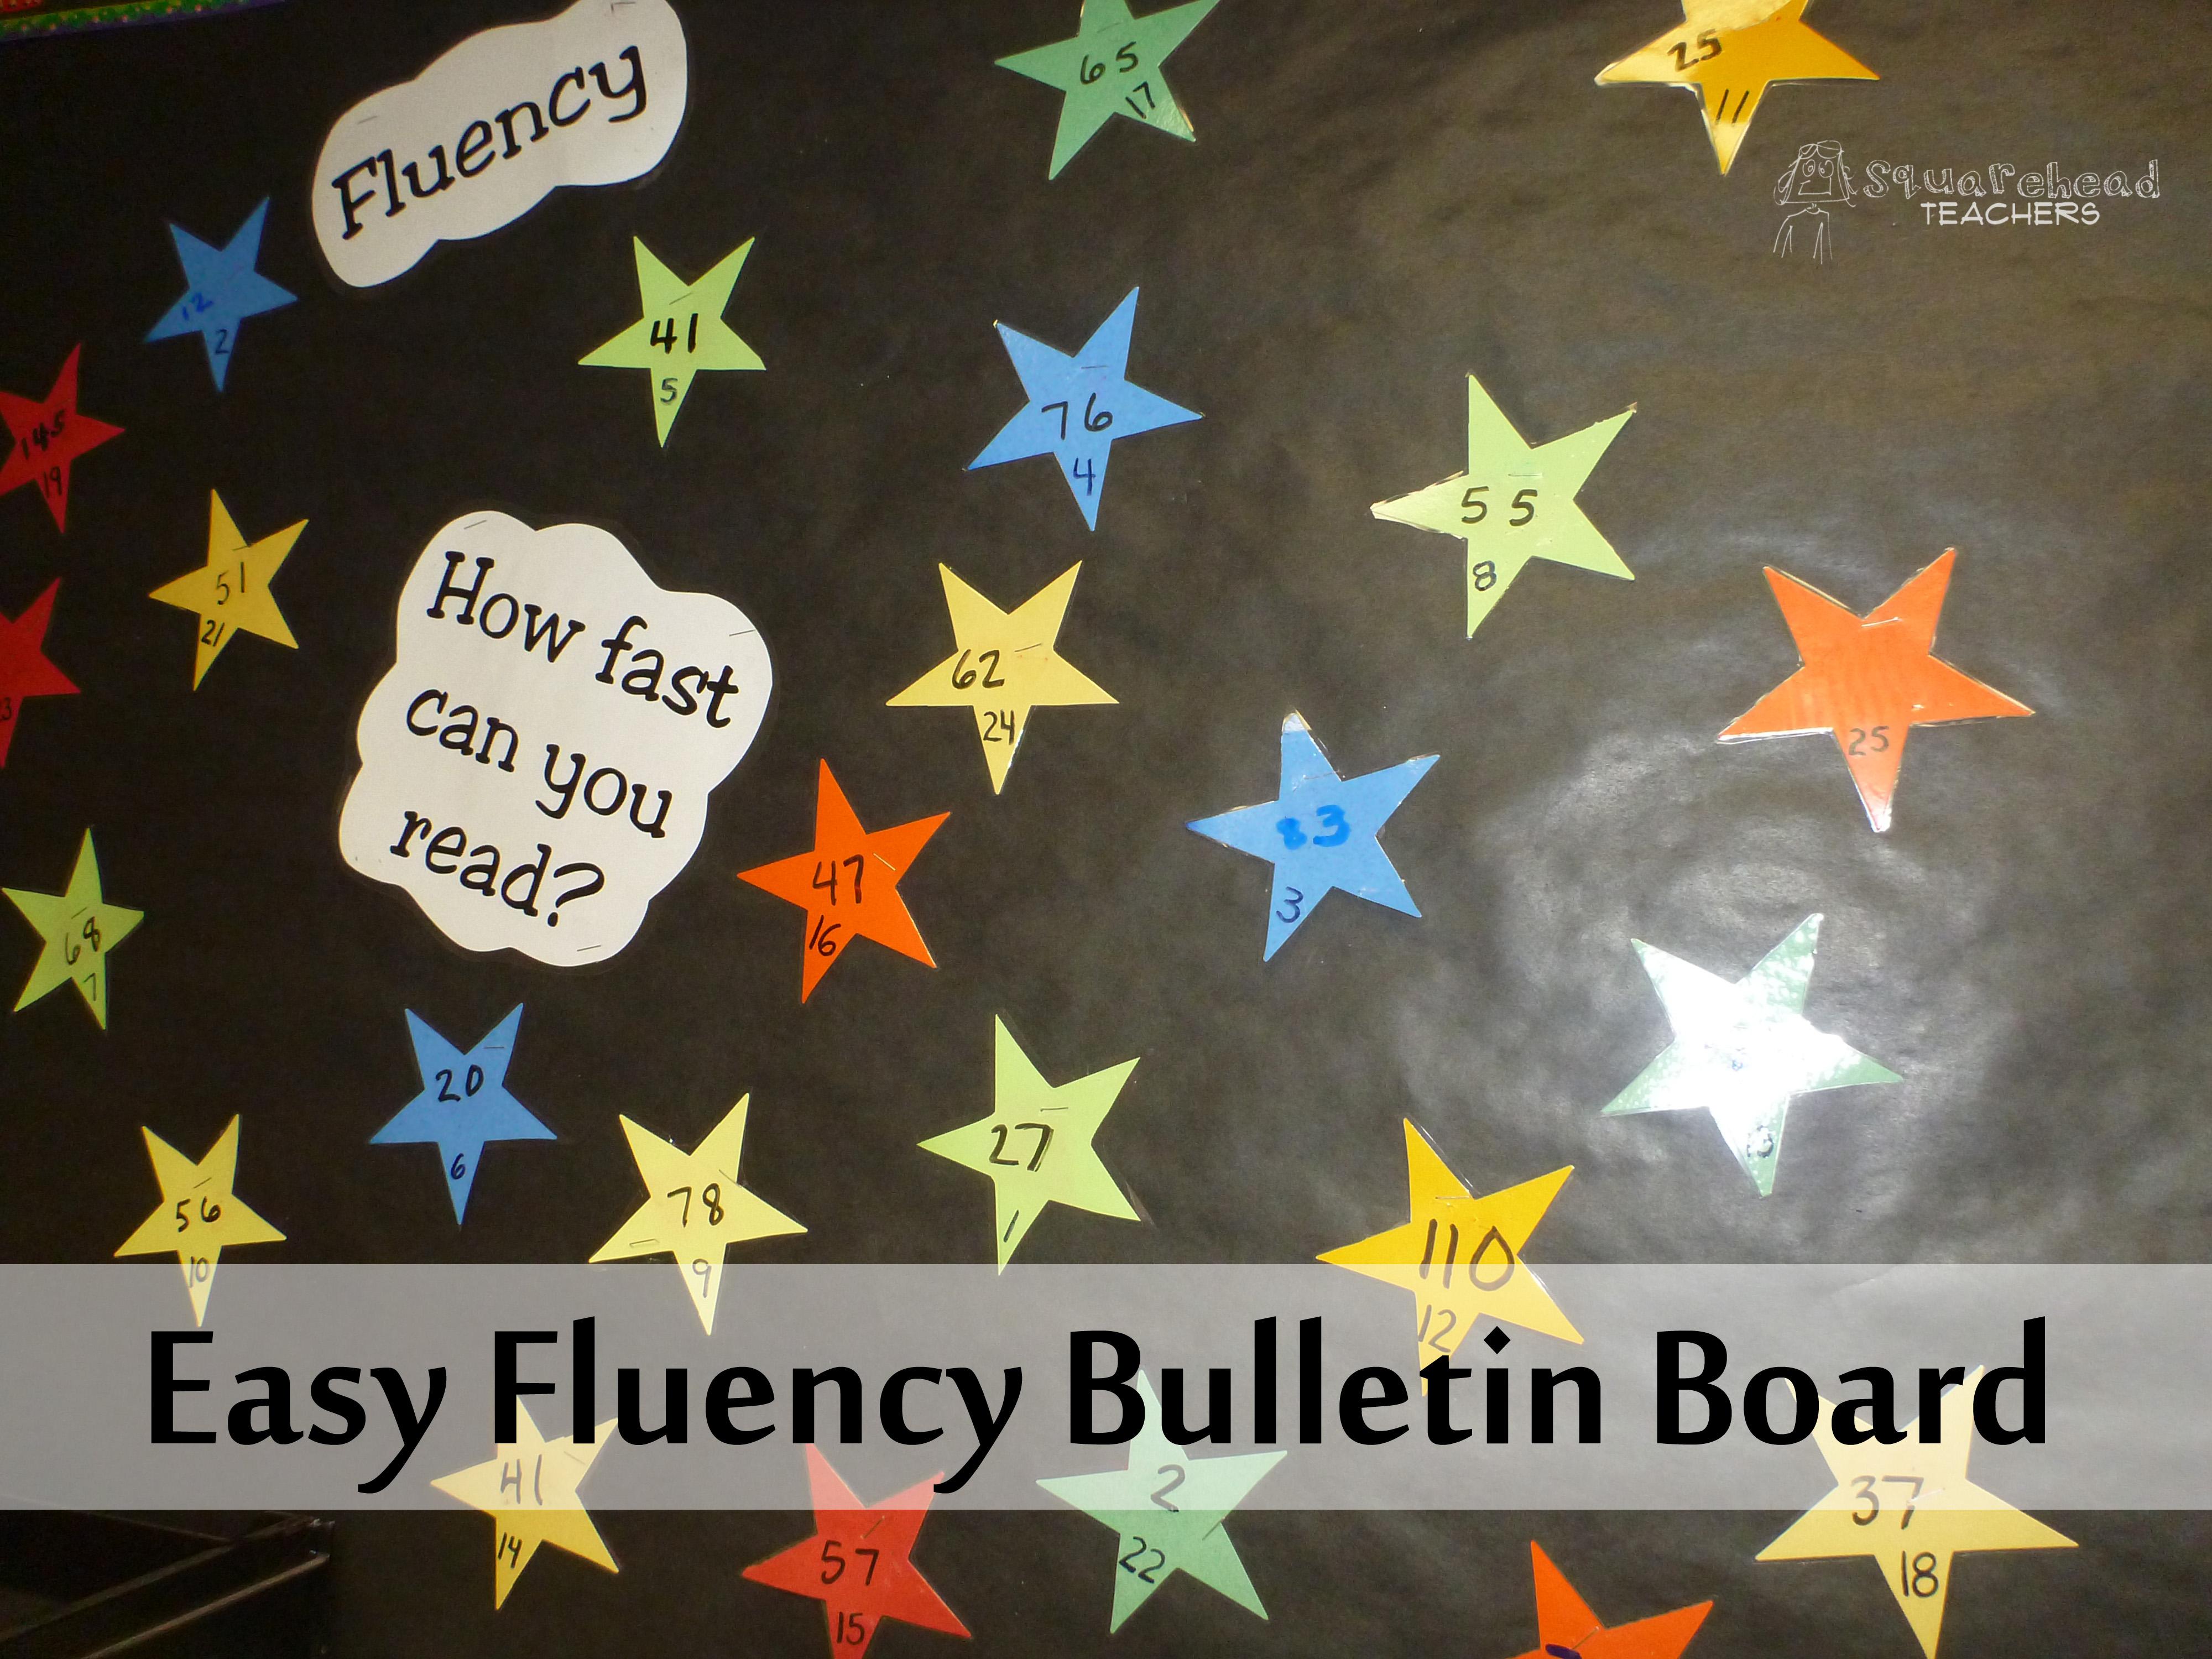 Fluency Squarehead Teachers